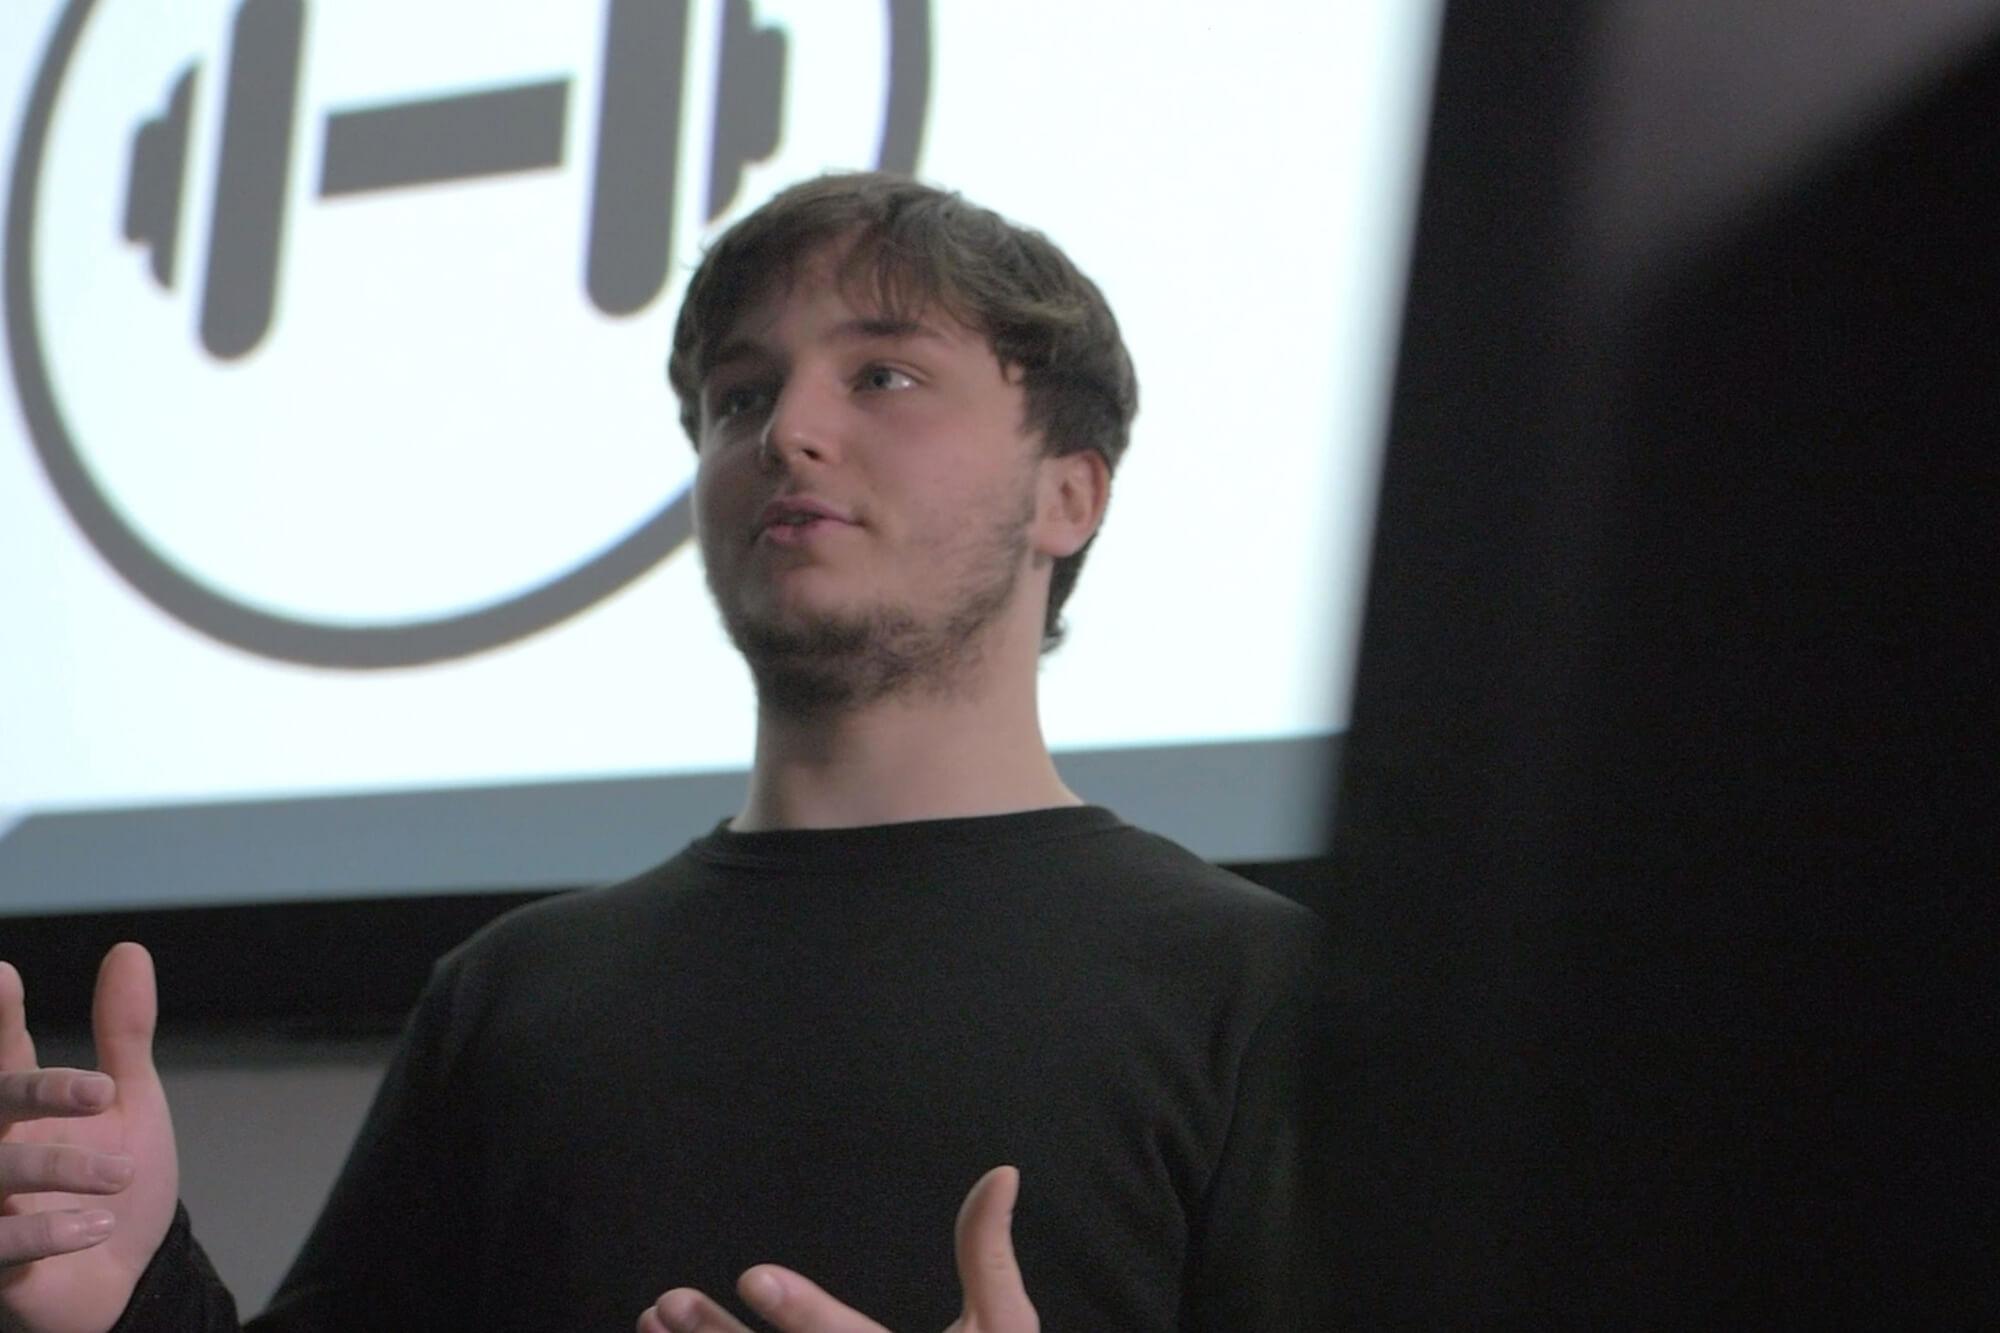 Tom Berrington presenting